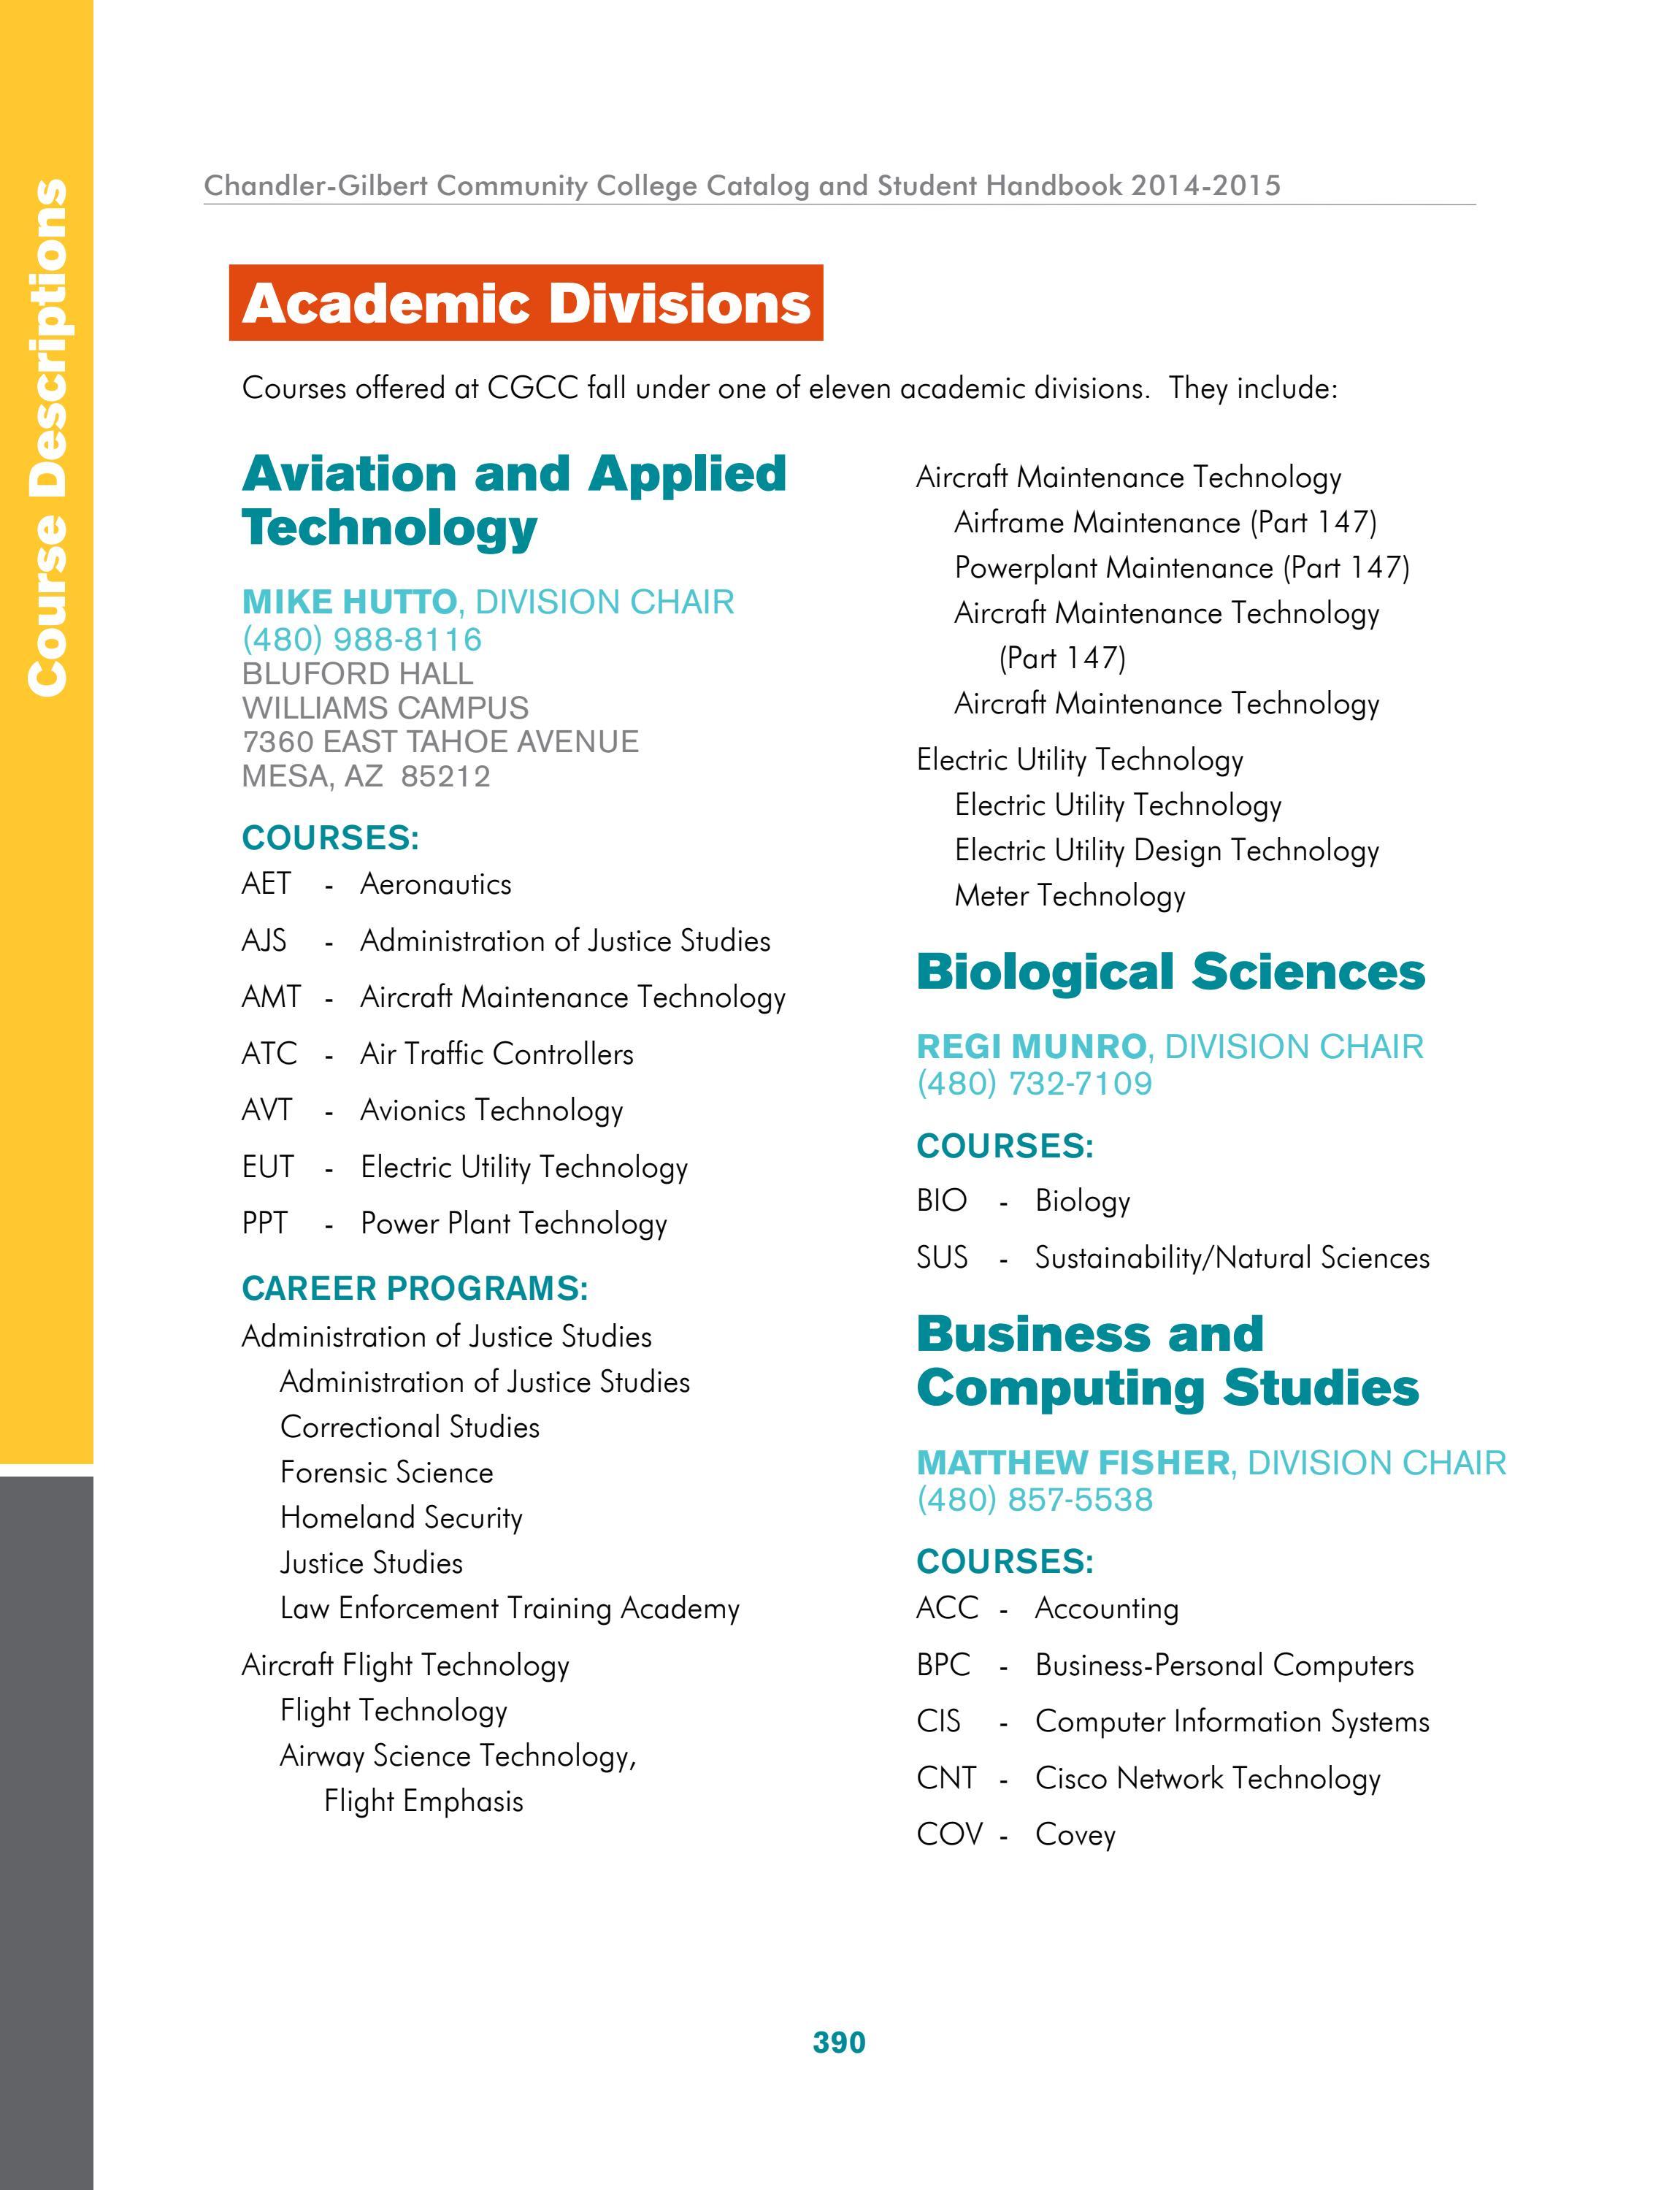 2014-2015 CGCC Catalog & Handbook (Part 2 of 2) by The